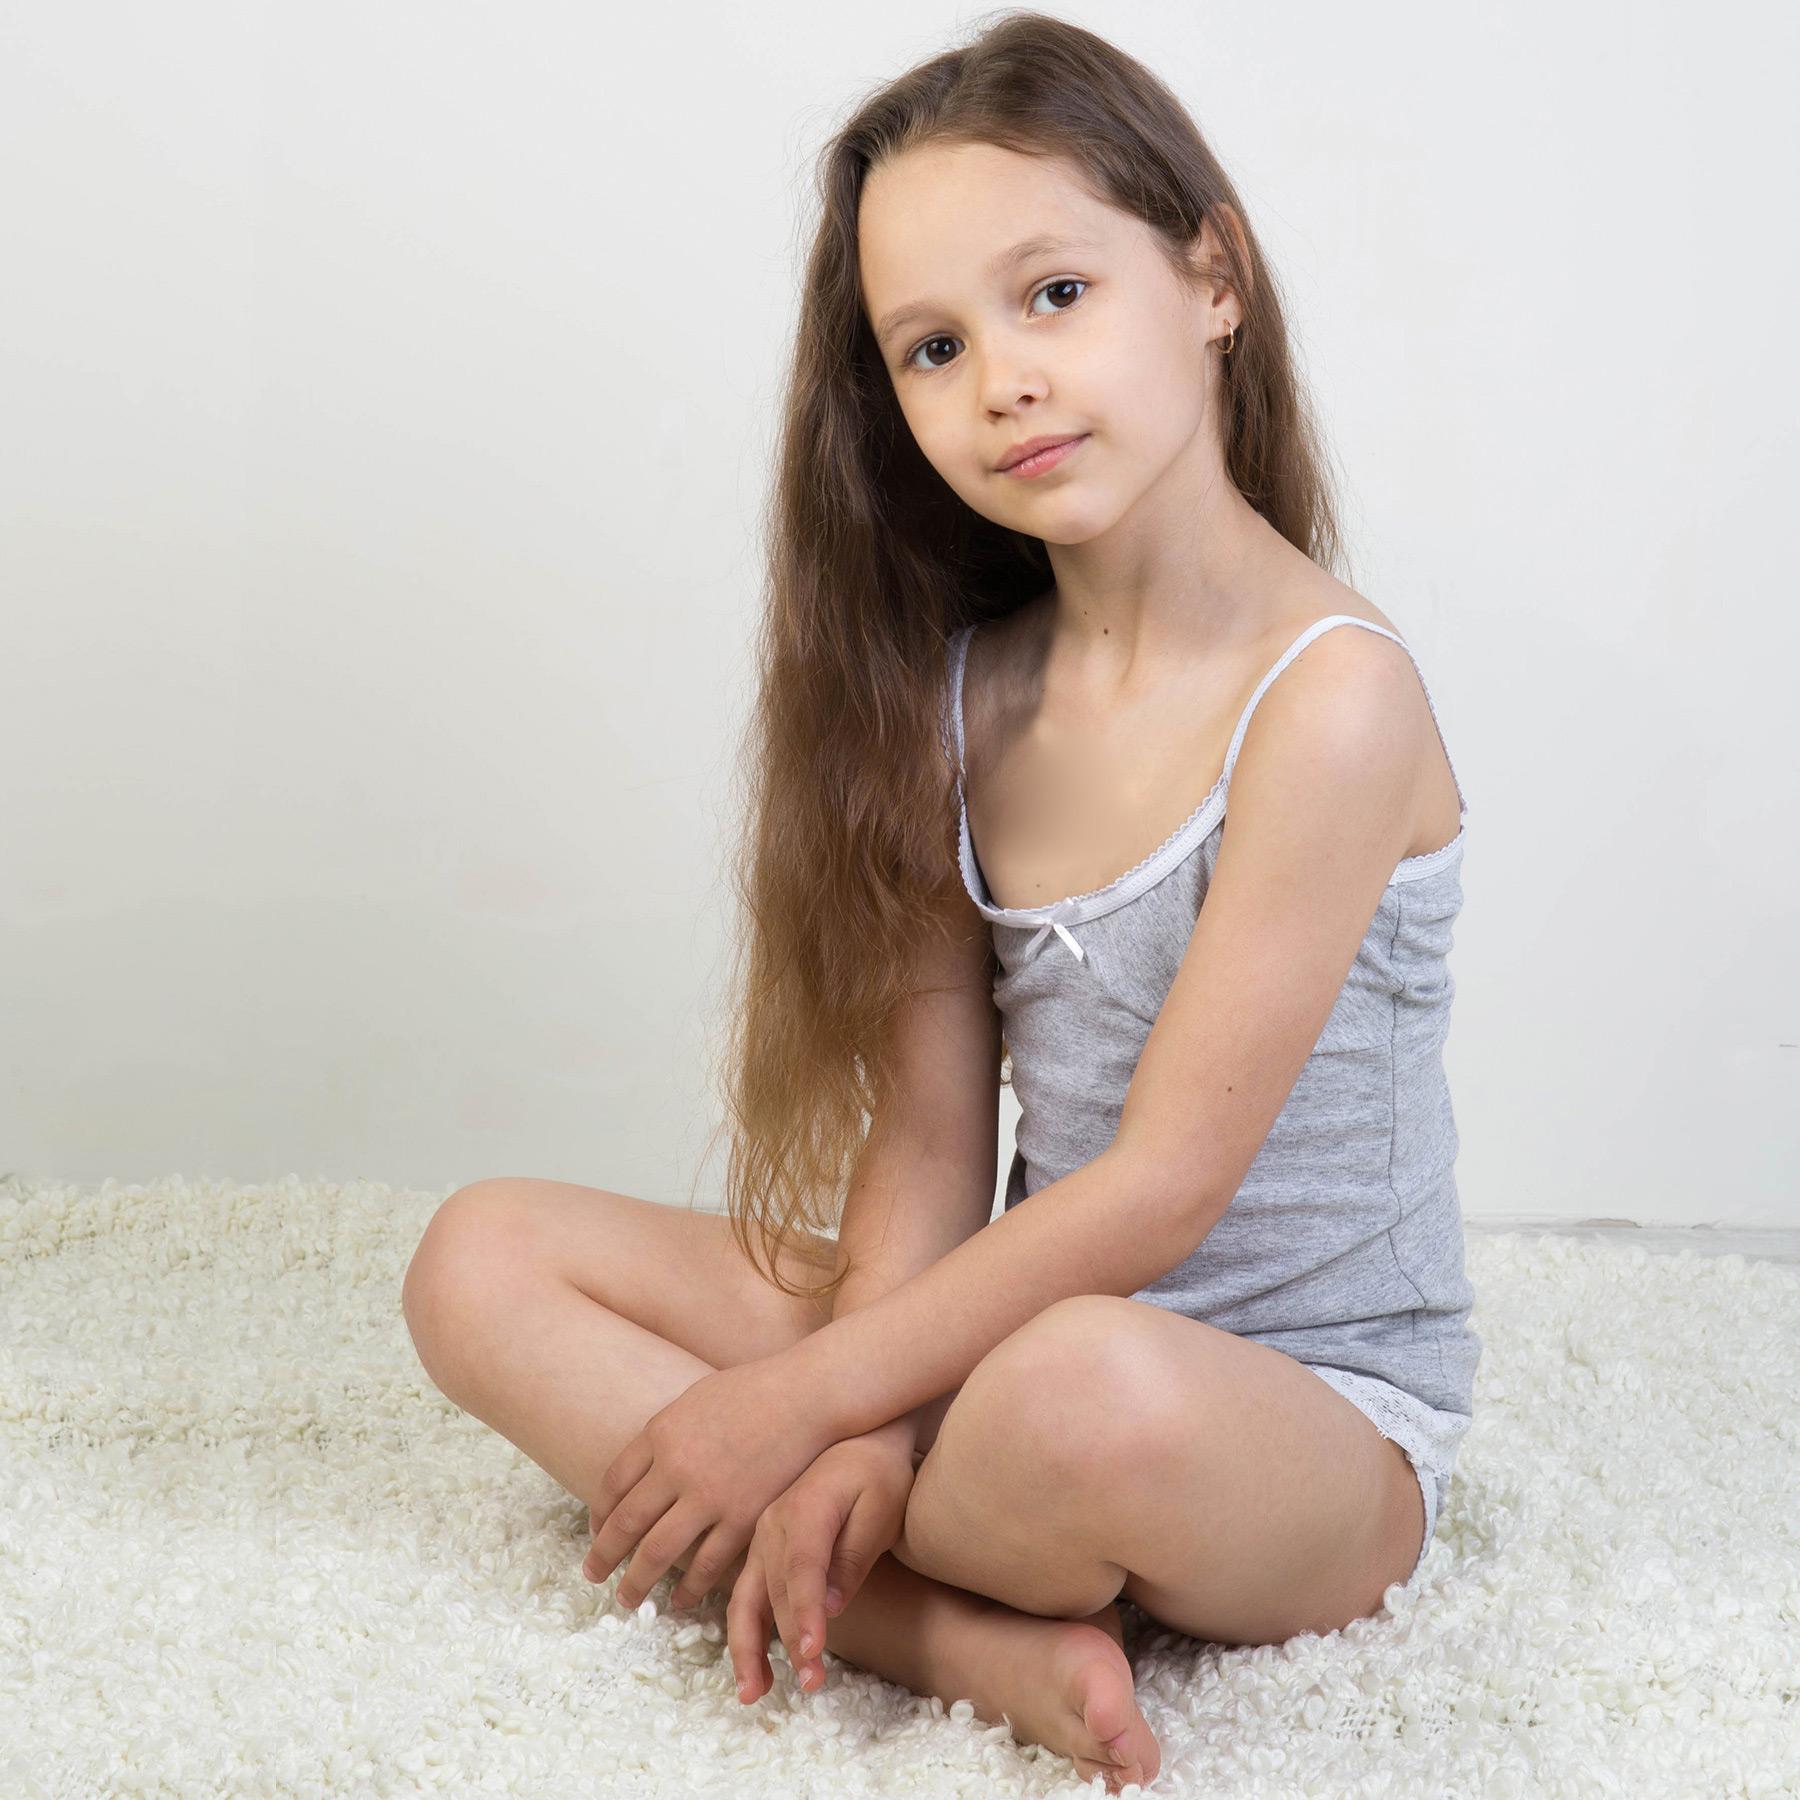 Mini Models Девочка Юная Обнаженная